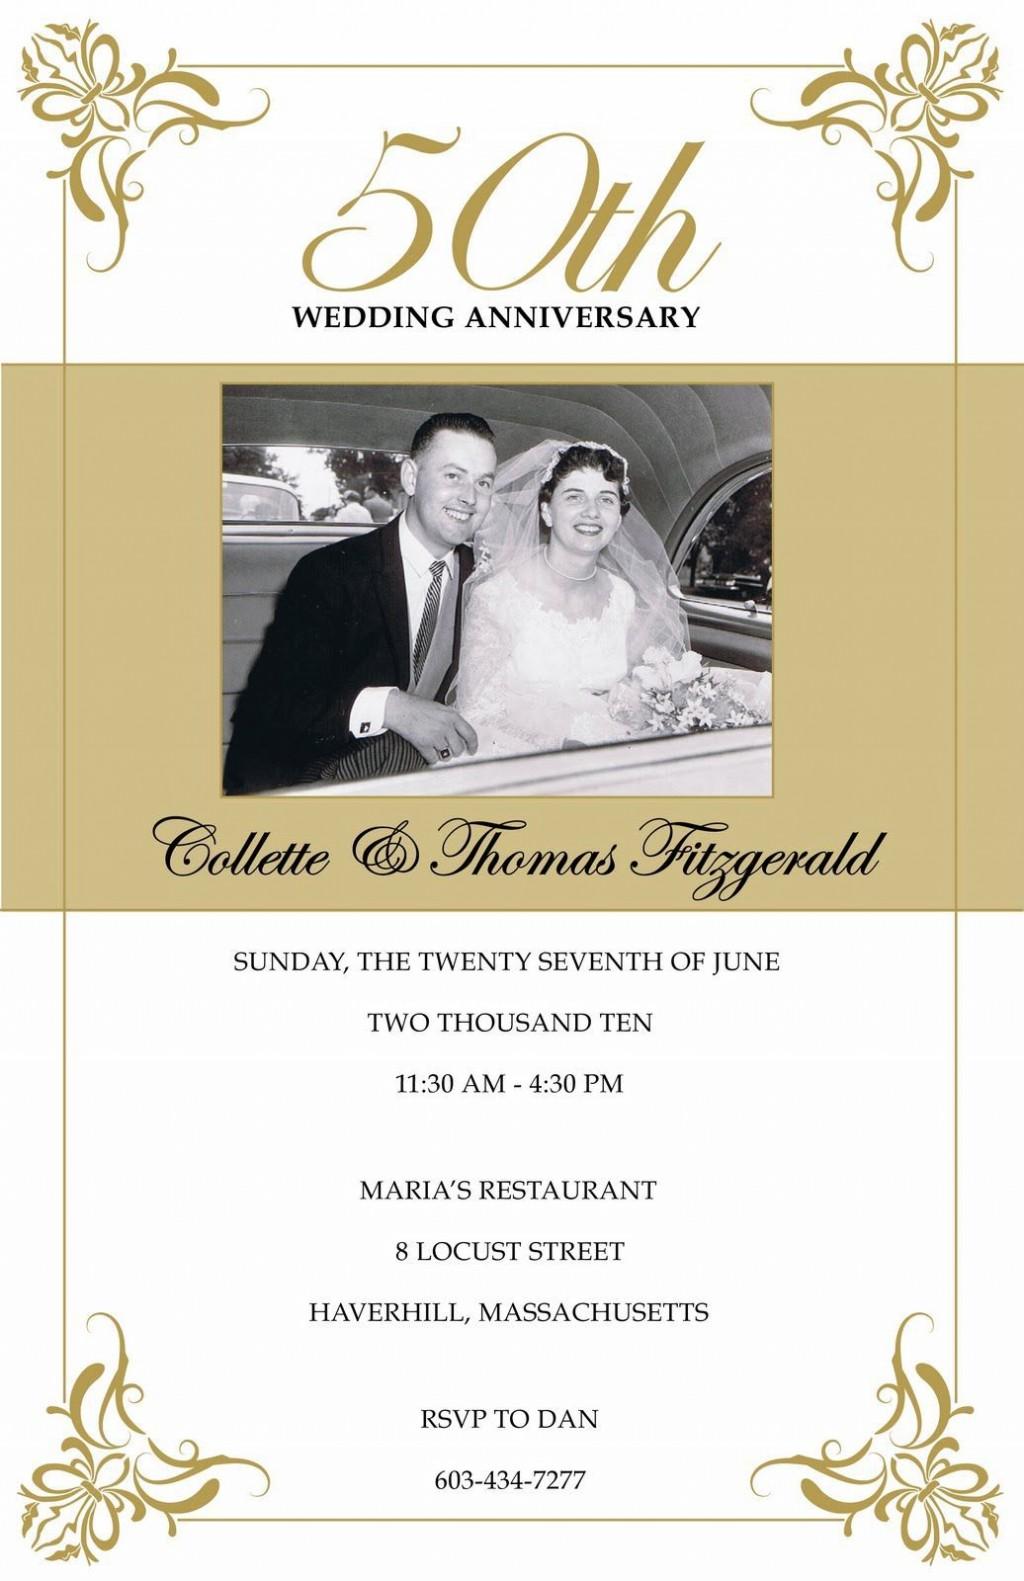 009 Unforgettable 50th Anniversary Invitation Template Free Design  For Word Golden Wedding DownloadLarge